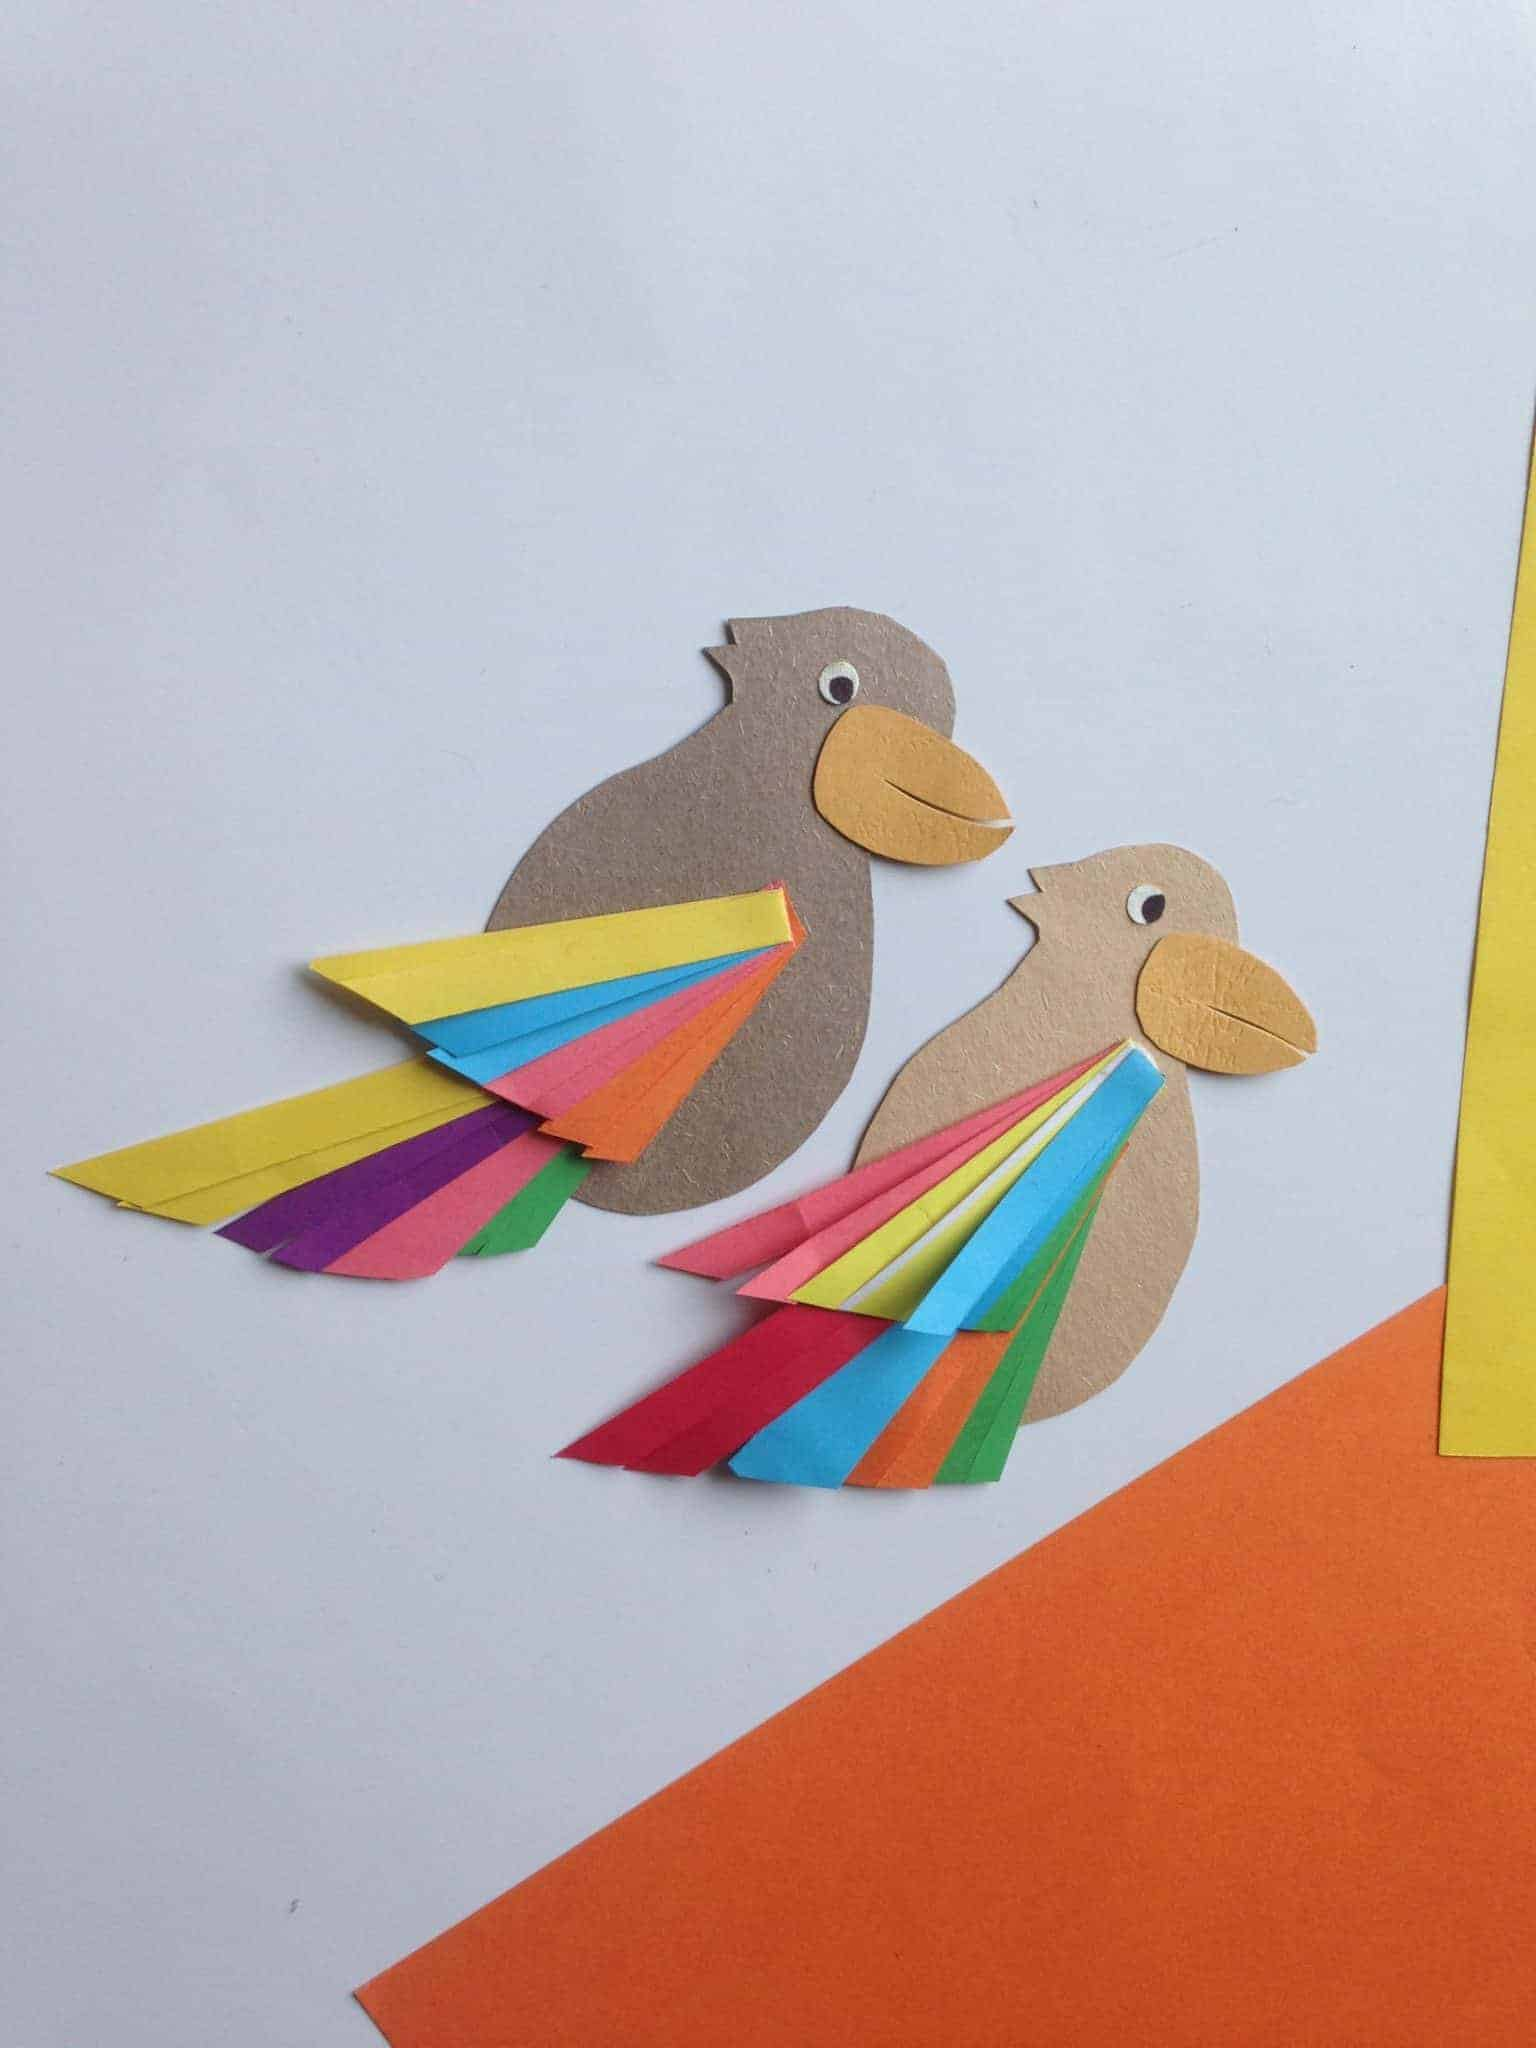 diy paper bird craft